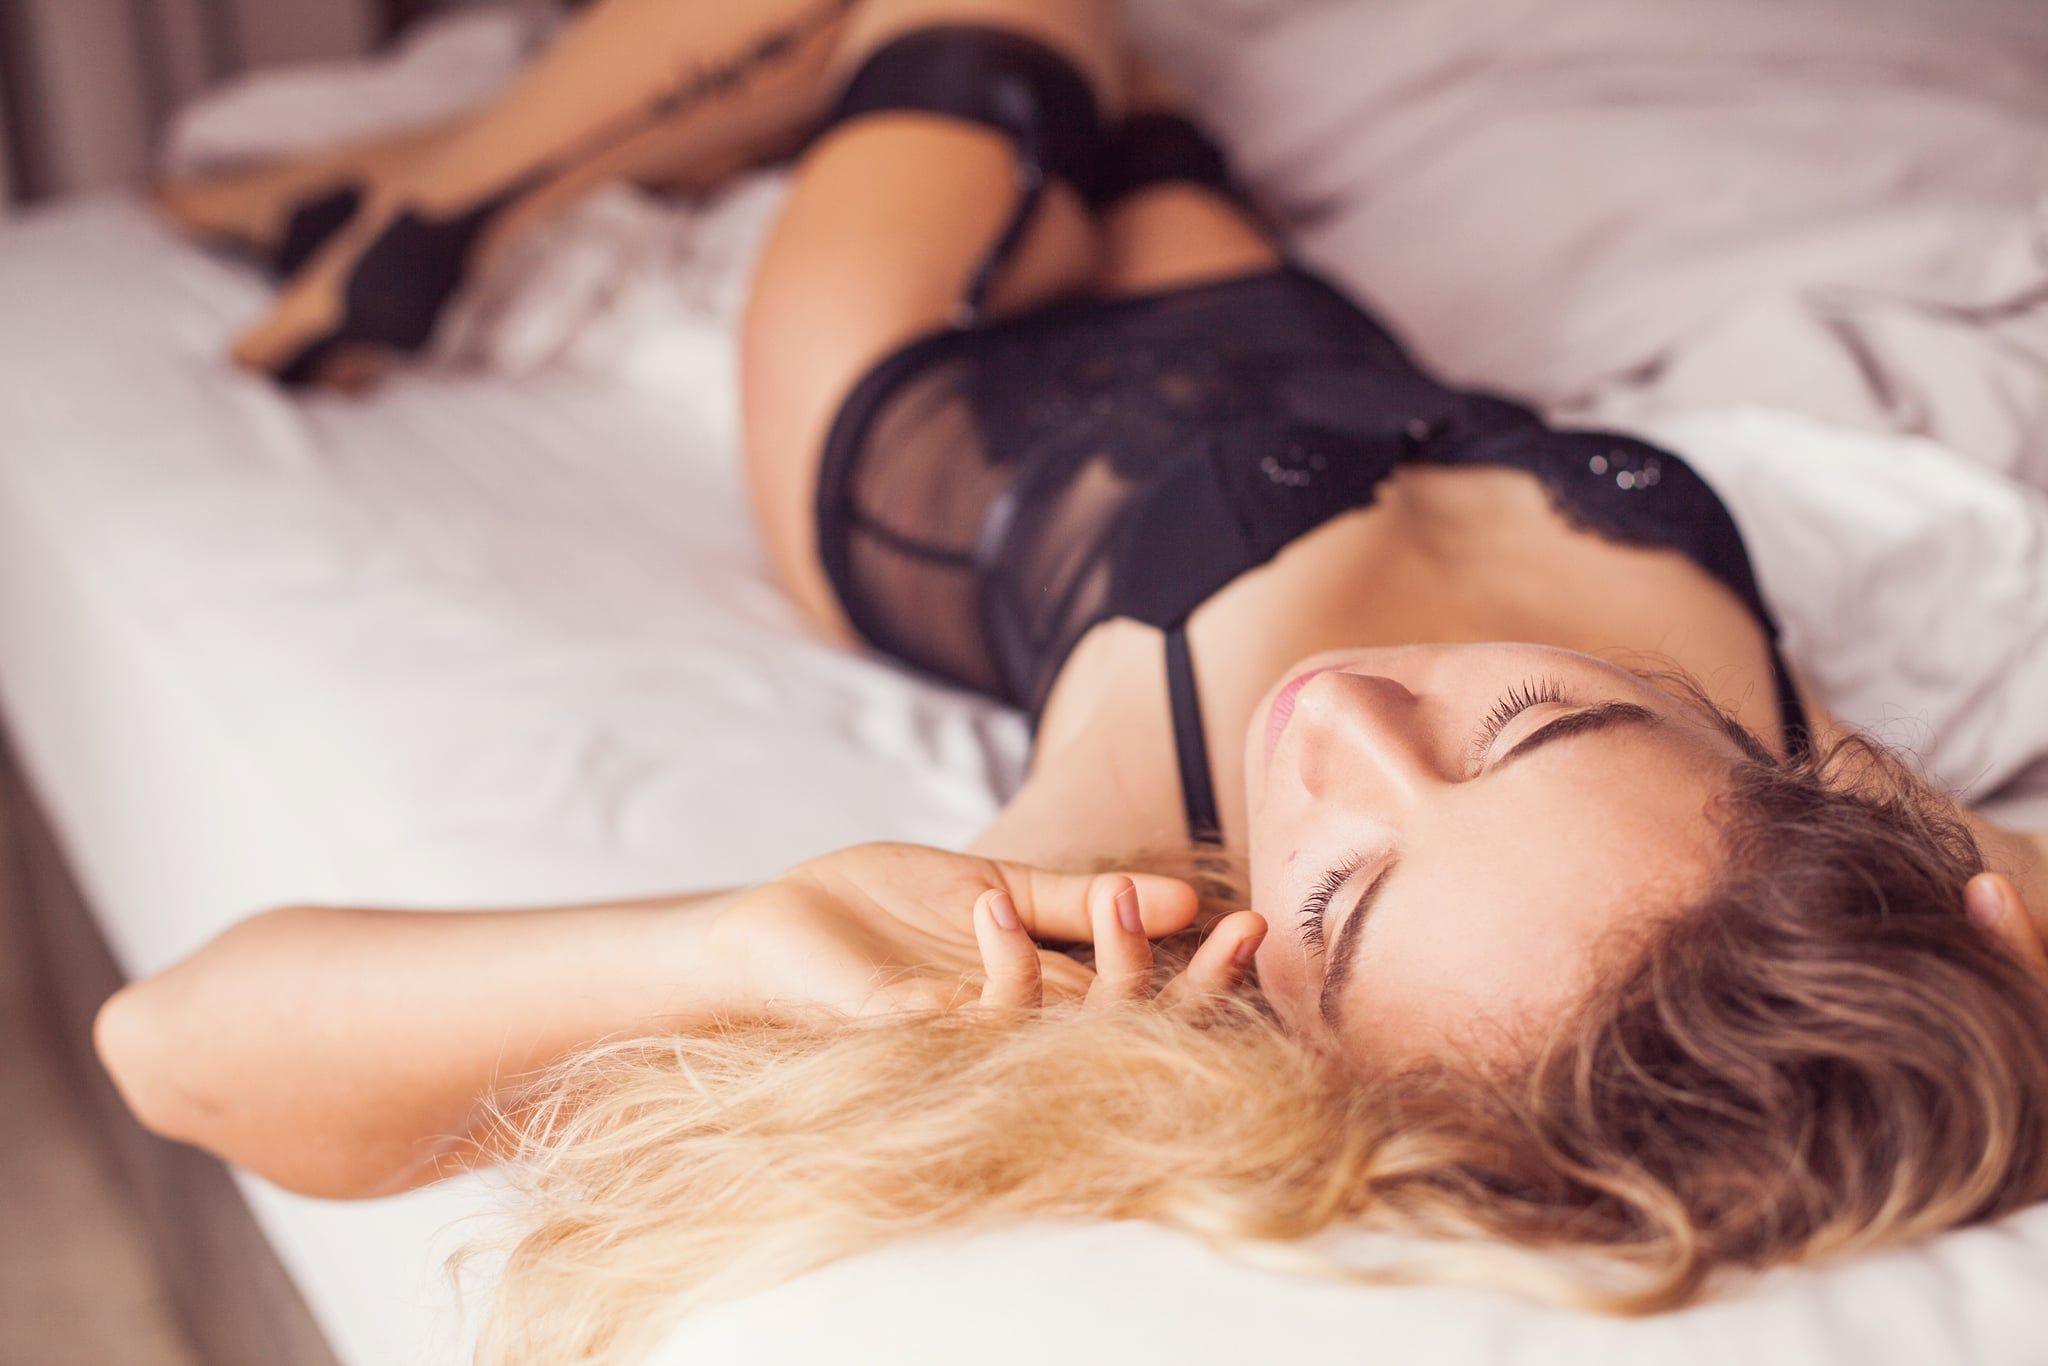 Thunderhead reccomend Female orgasm watch video climax